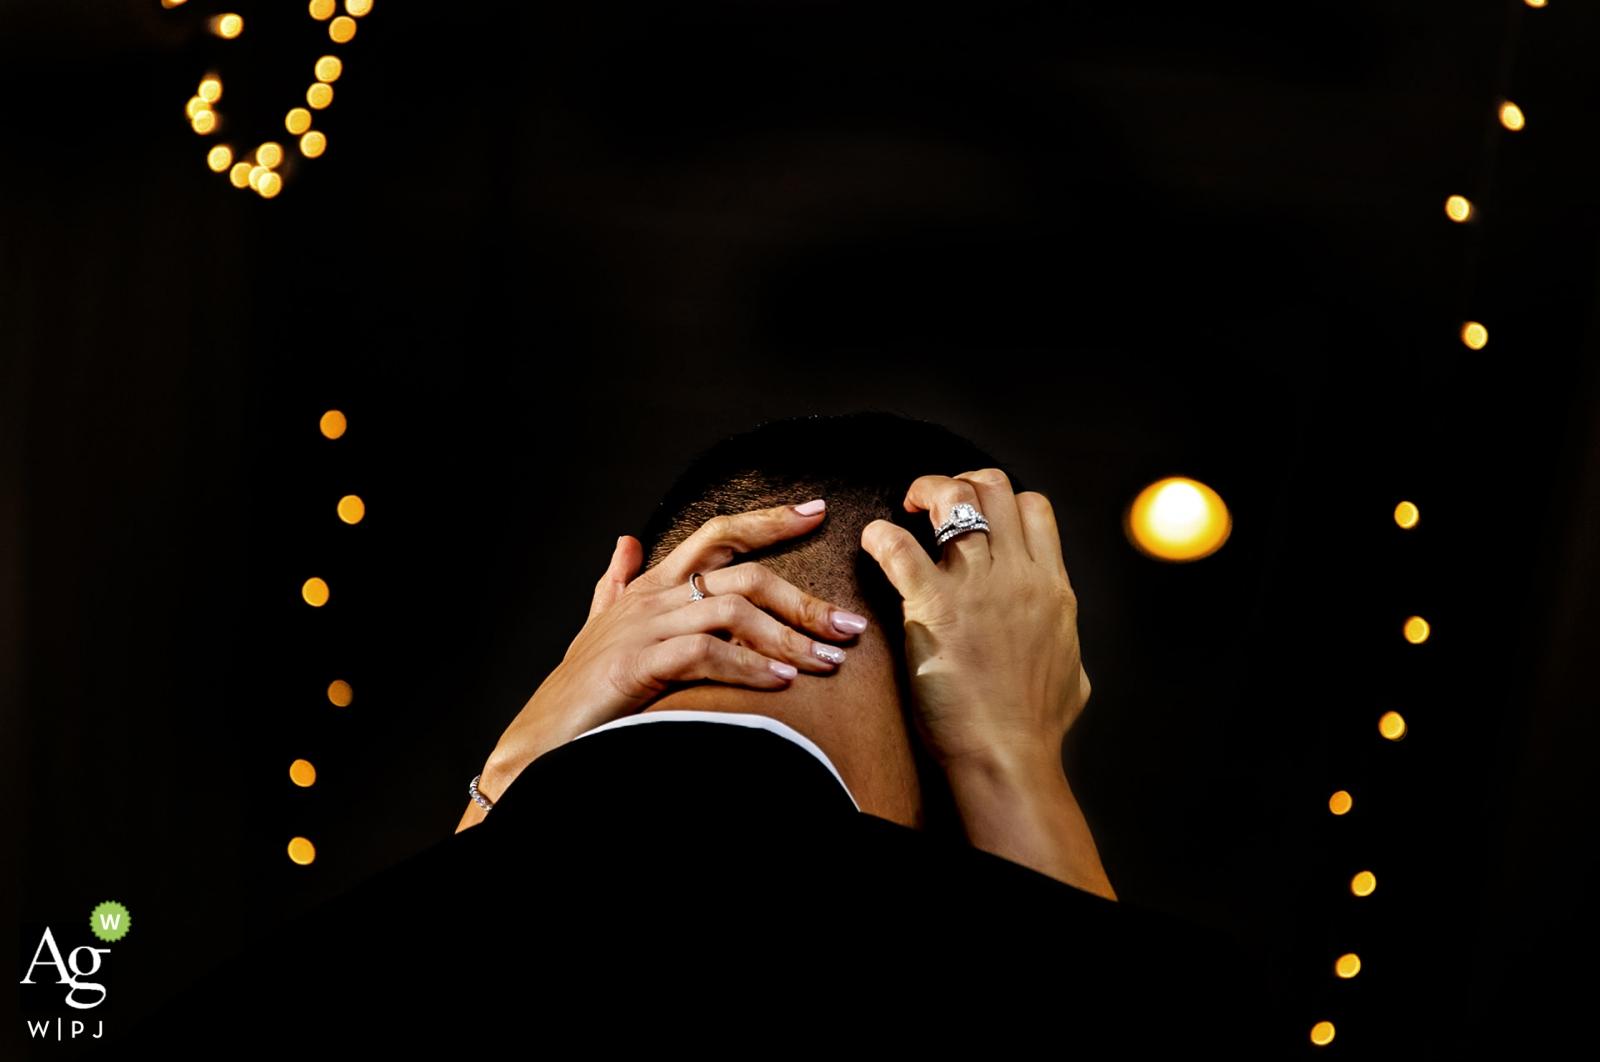 Brooke Mayo is an artistic wedding photographer for North Carolina